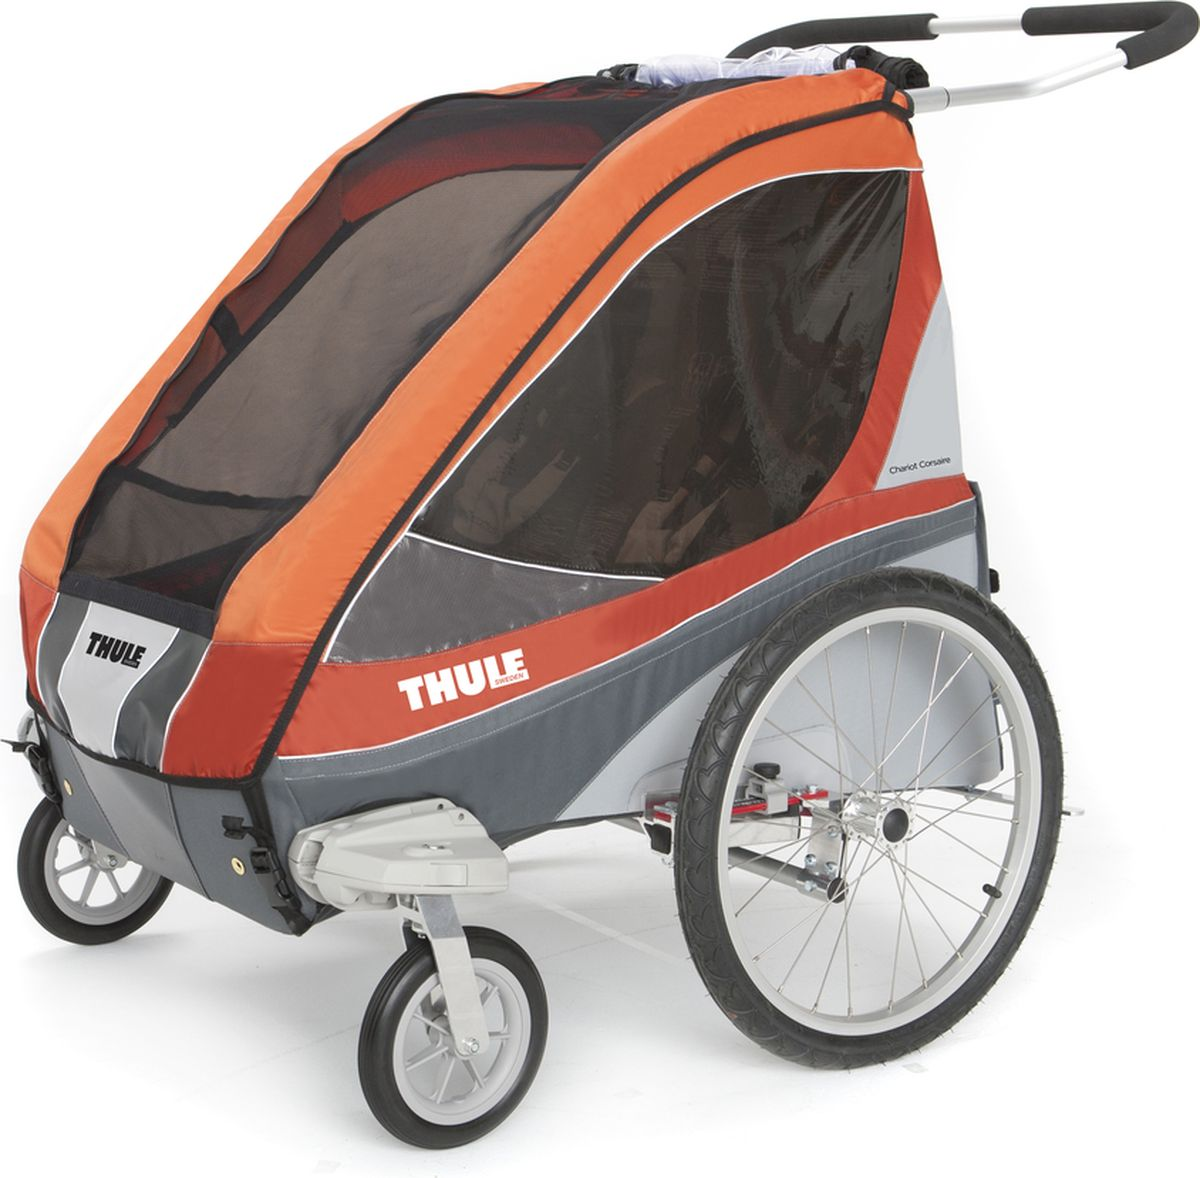 Thule Коляска-трансформер Chariot Corsaire 2 цвет абрикосовый teddy коляска 2 в 1 giovani цвет серый